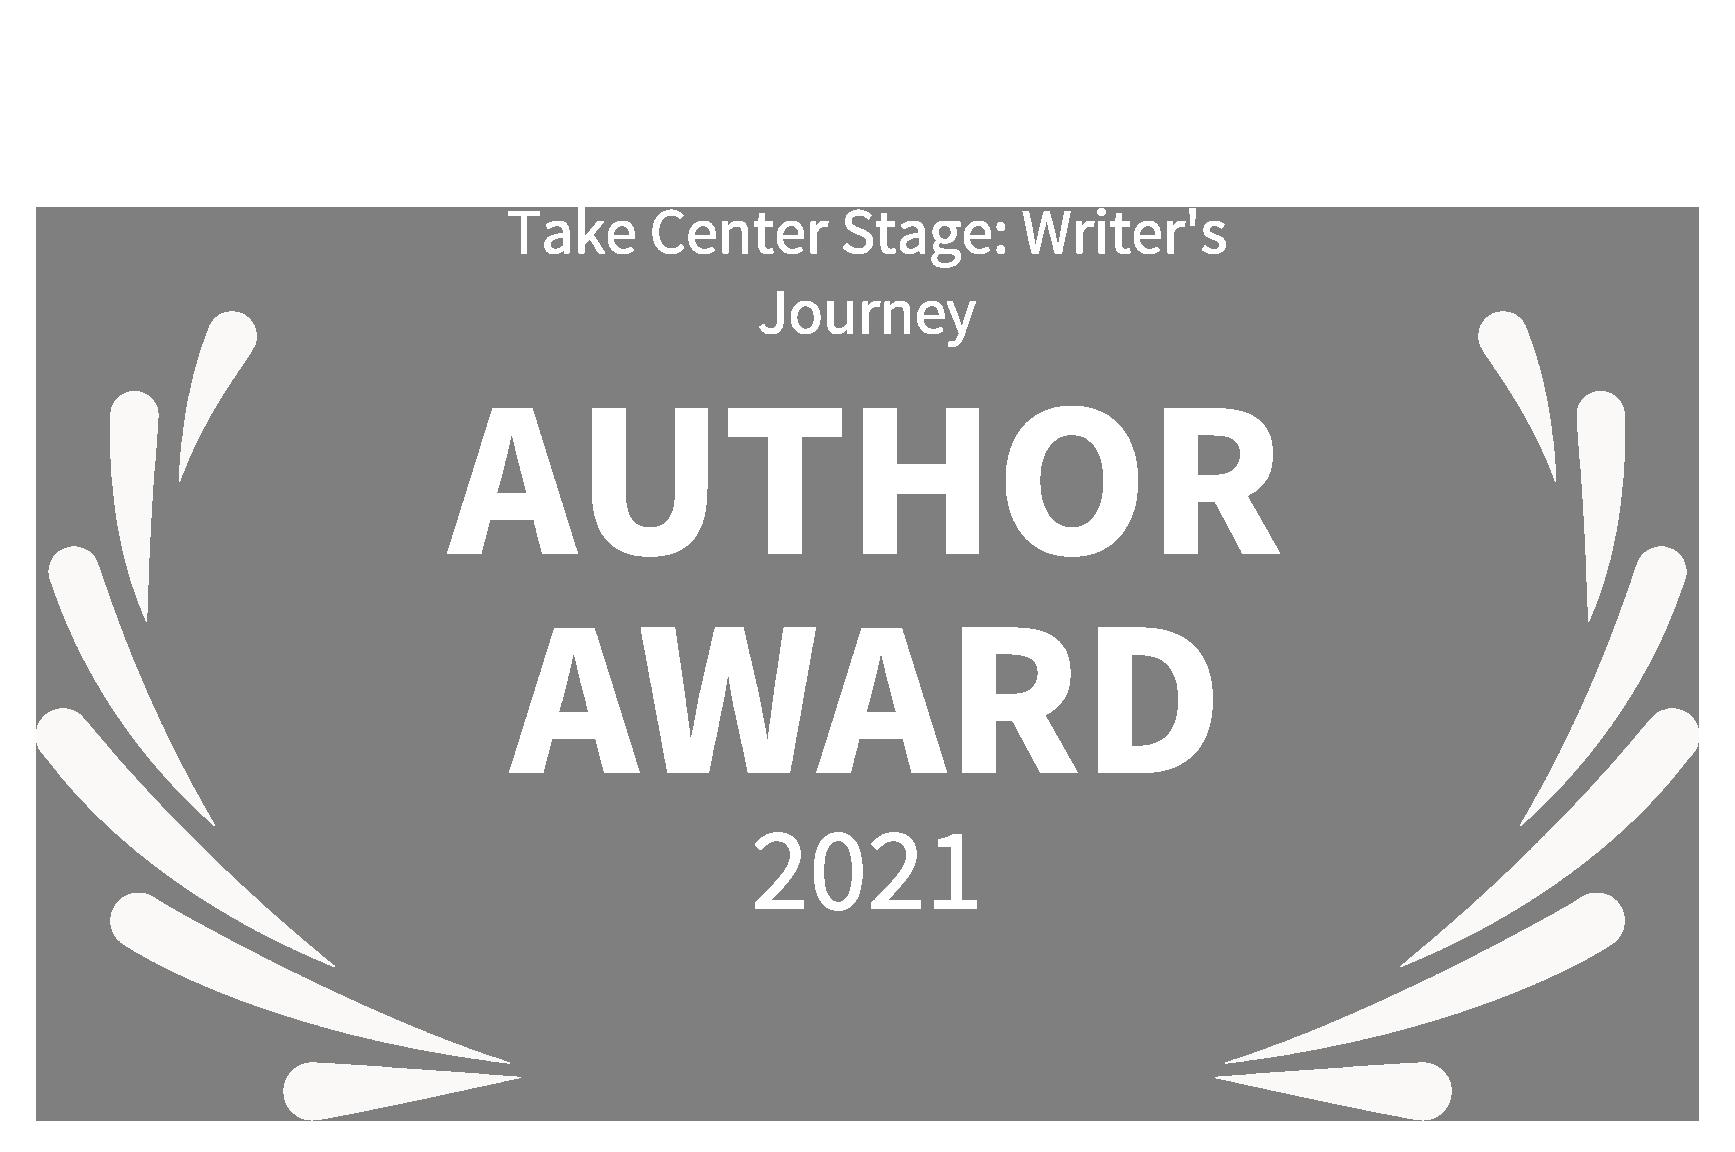 Take Center Stage - Authors Award